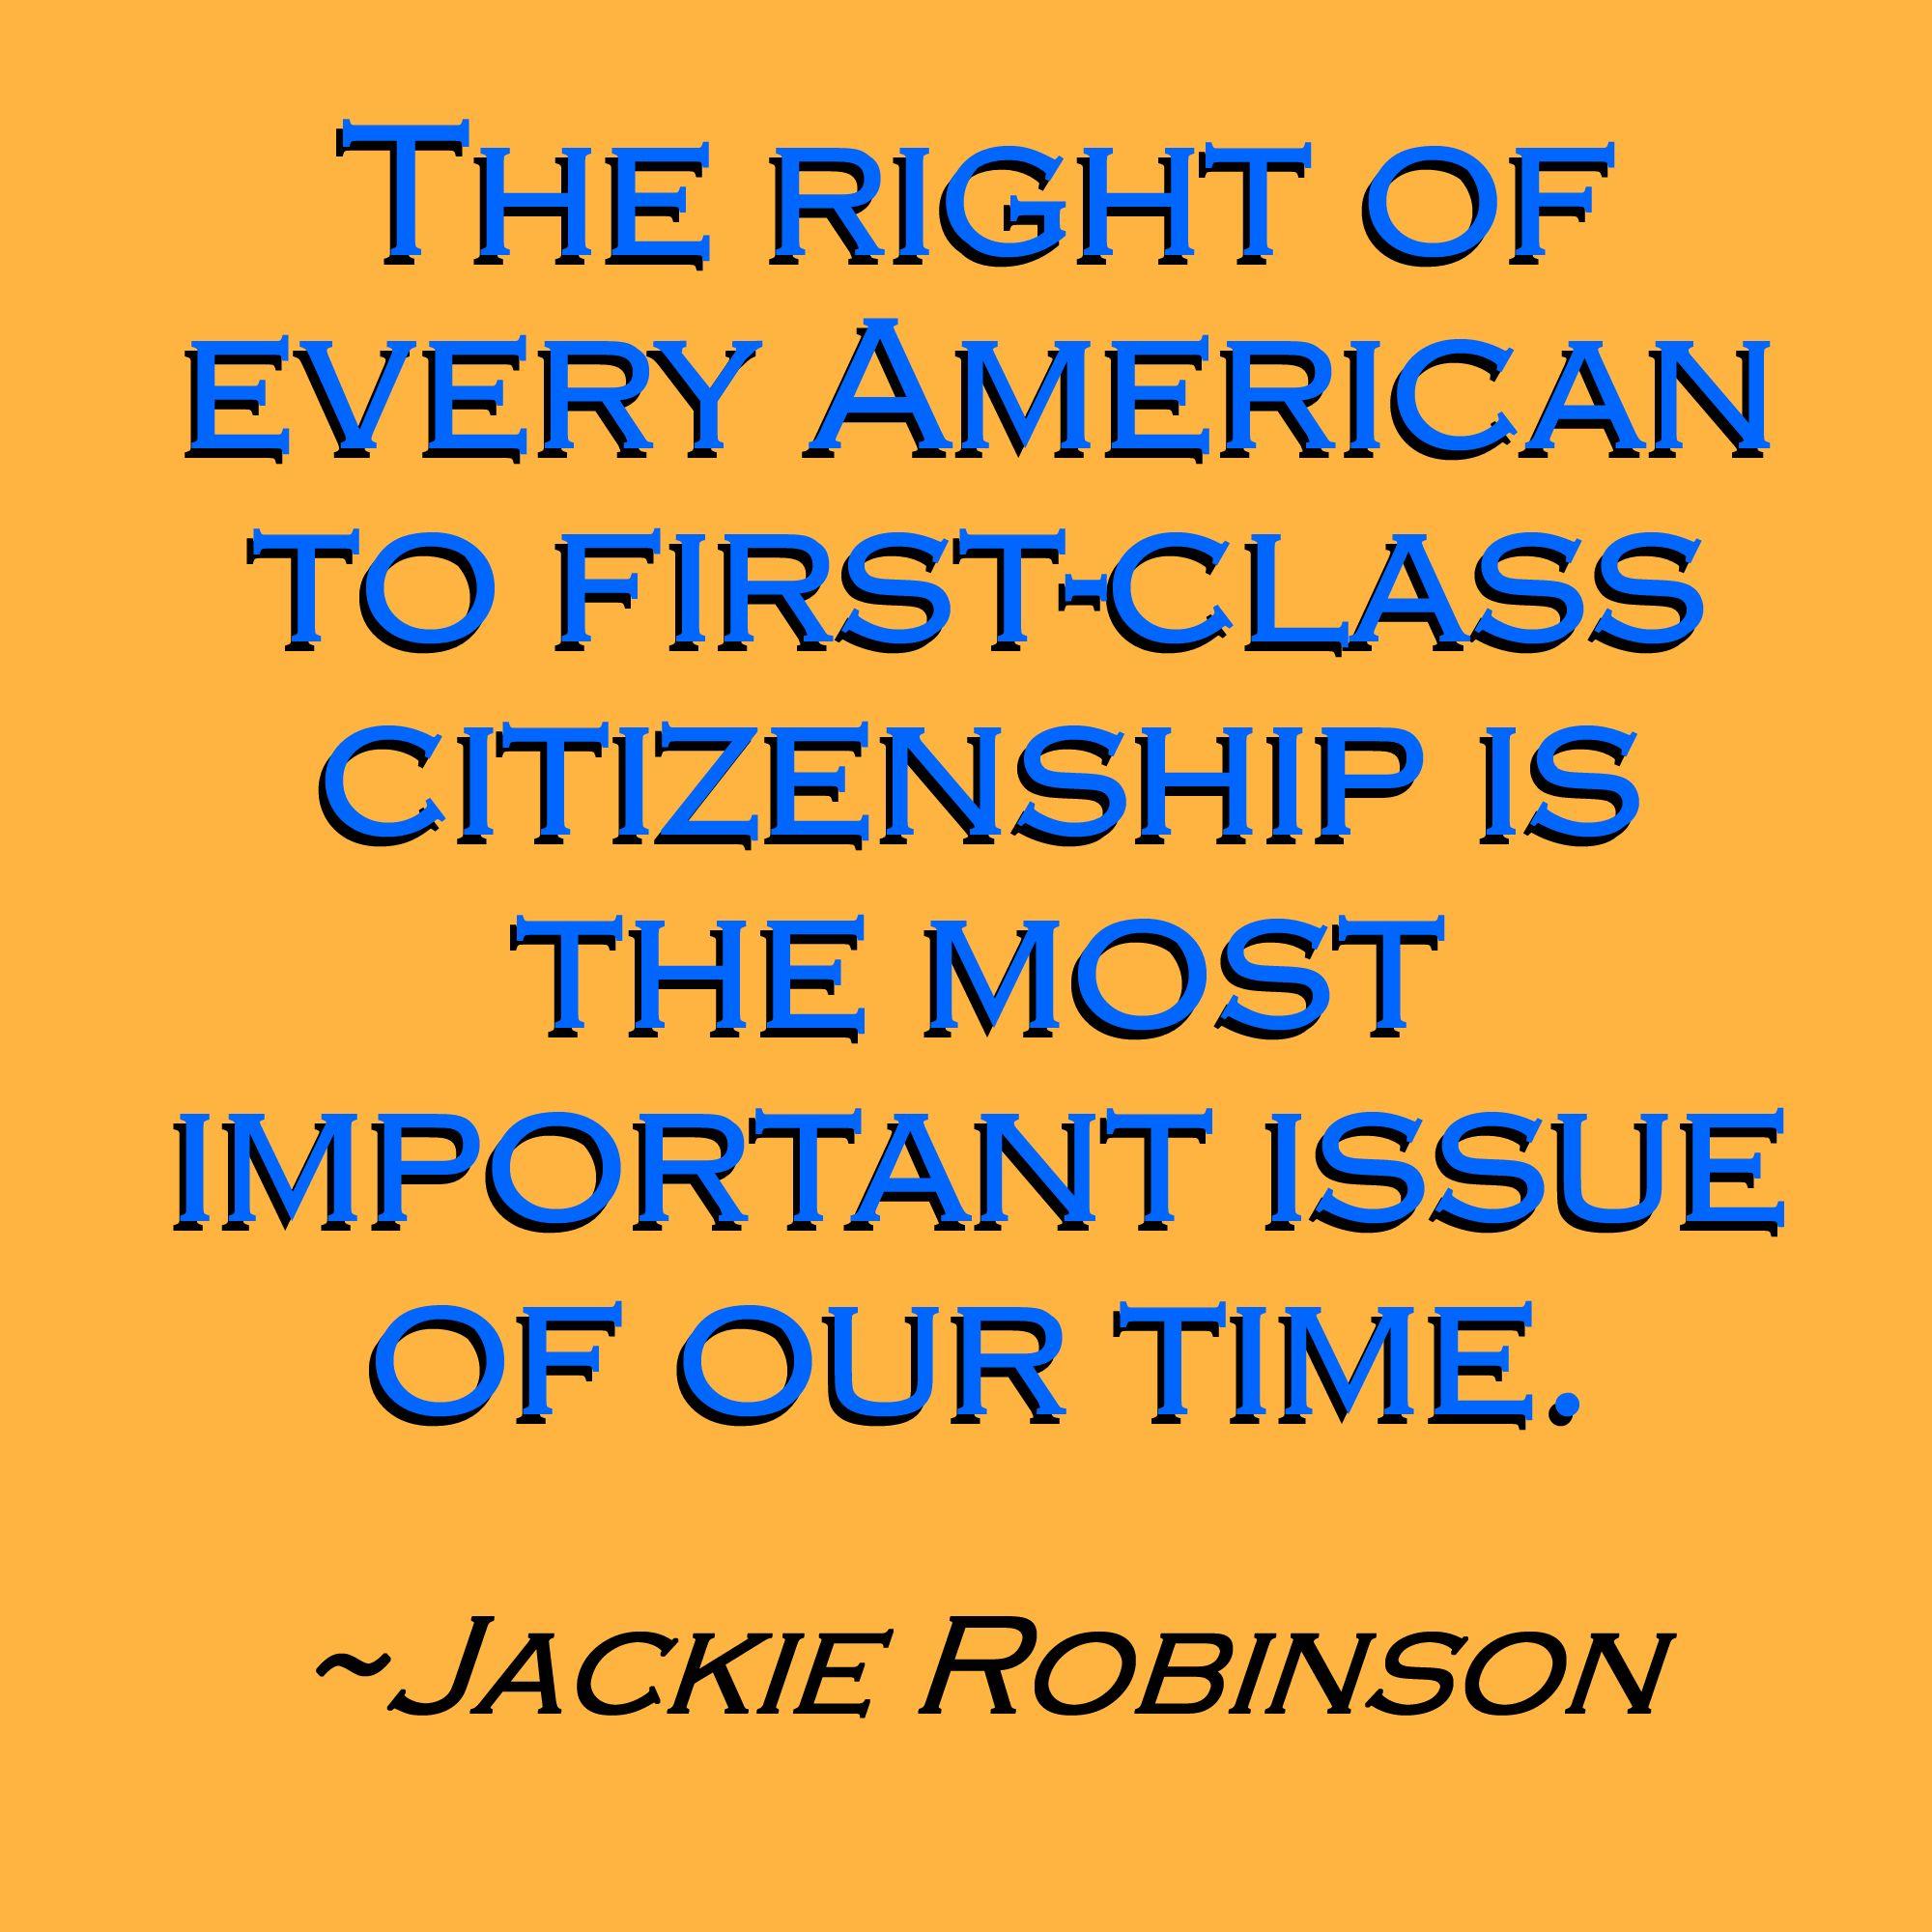 jackie robinson quotes quotes quotes quotes and jackie robinson jackie robinson quote